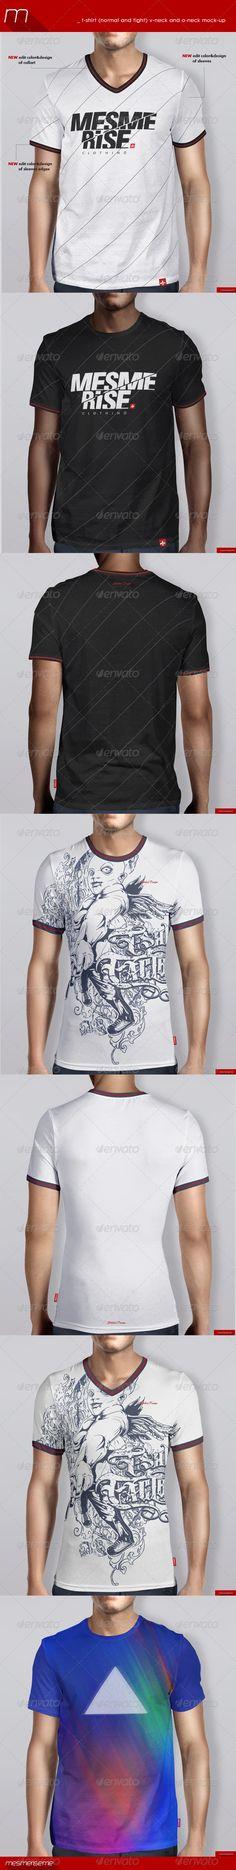 T-Shirt Mockups Studio Edition by MintMockups Professional set of 8 ...